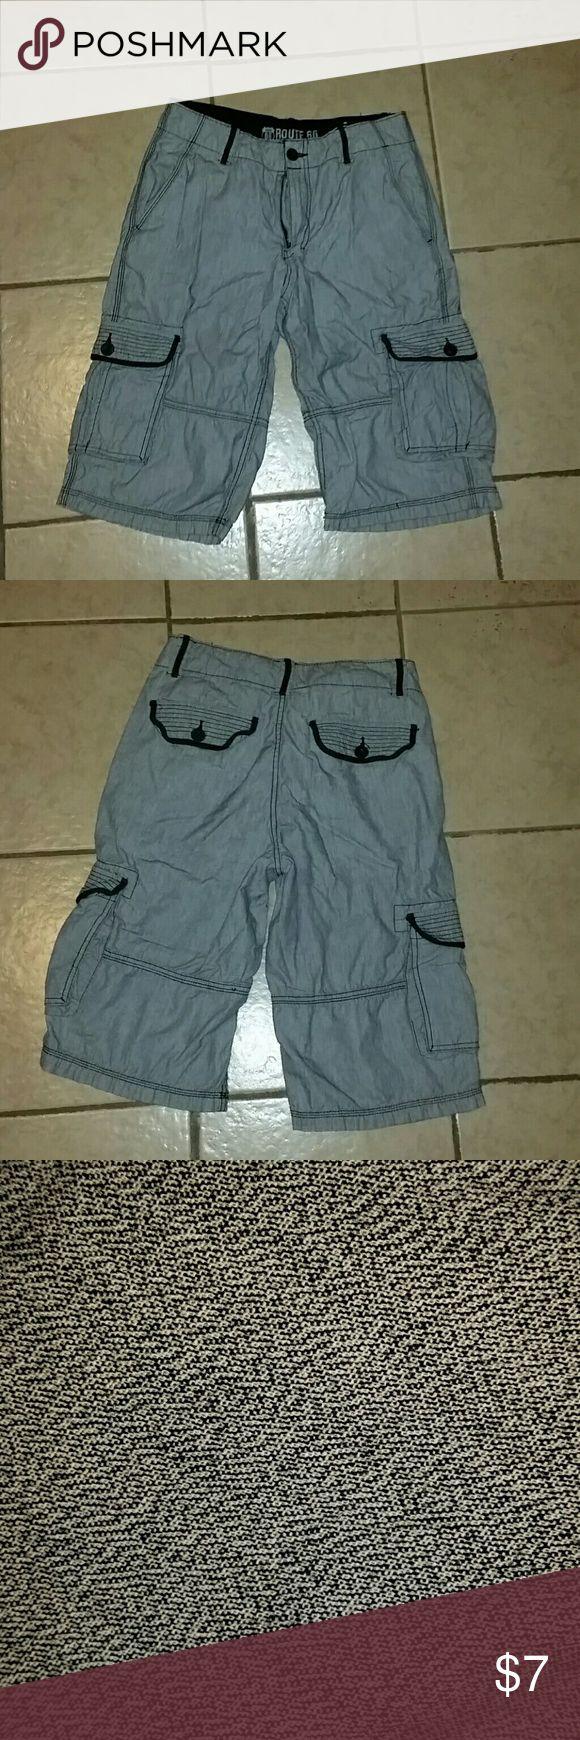 Men's long shorts Men's long shorts. Route 66 Shorts